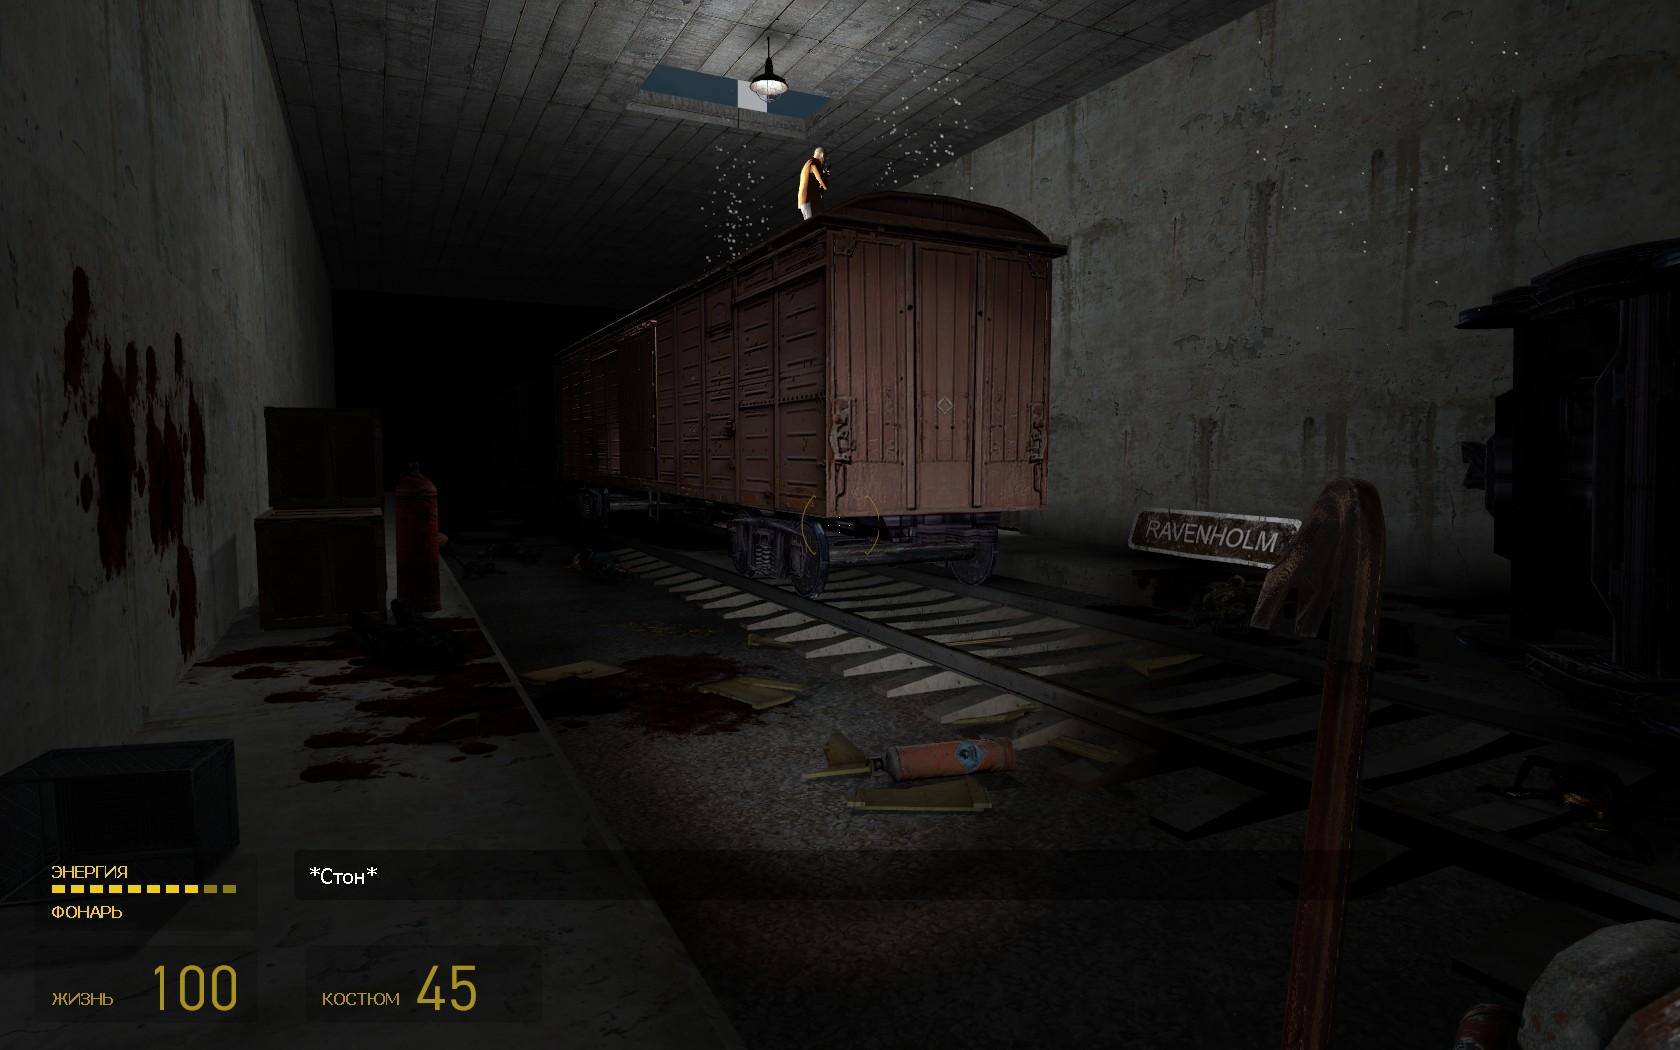 ravenholmlc20007 - Half-Life 2 ravenholmlc20007